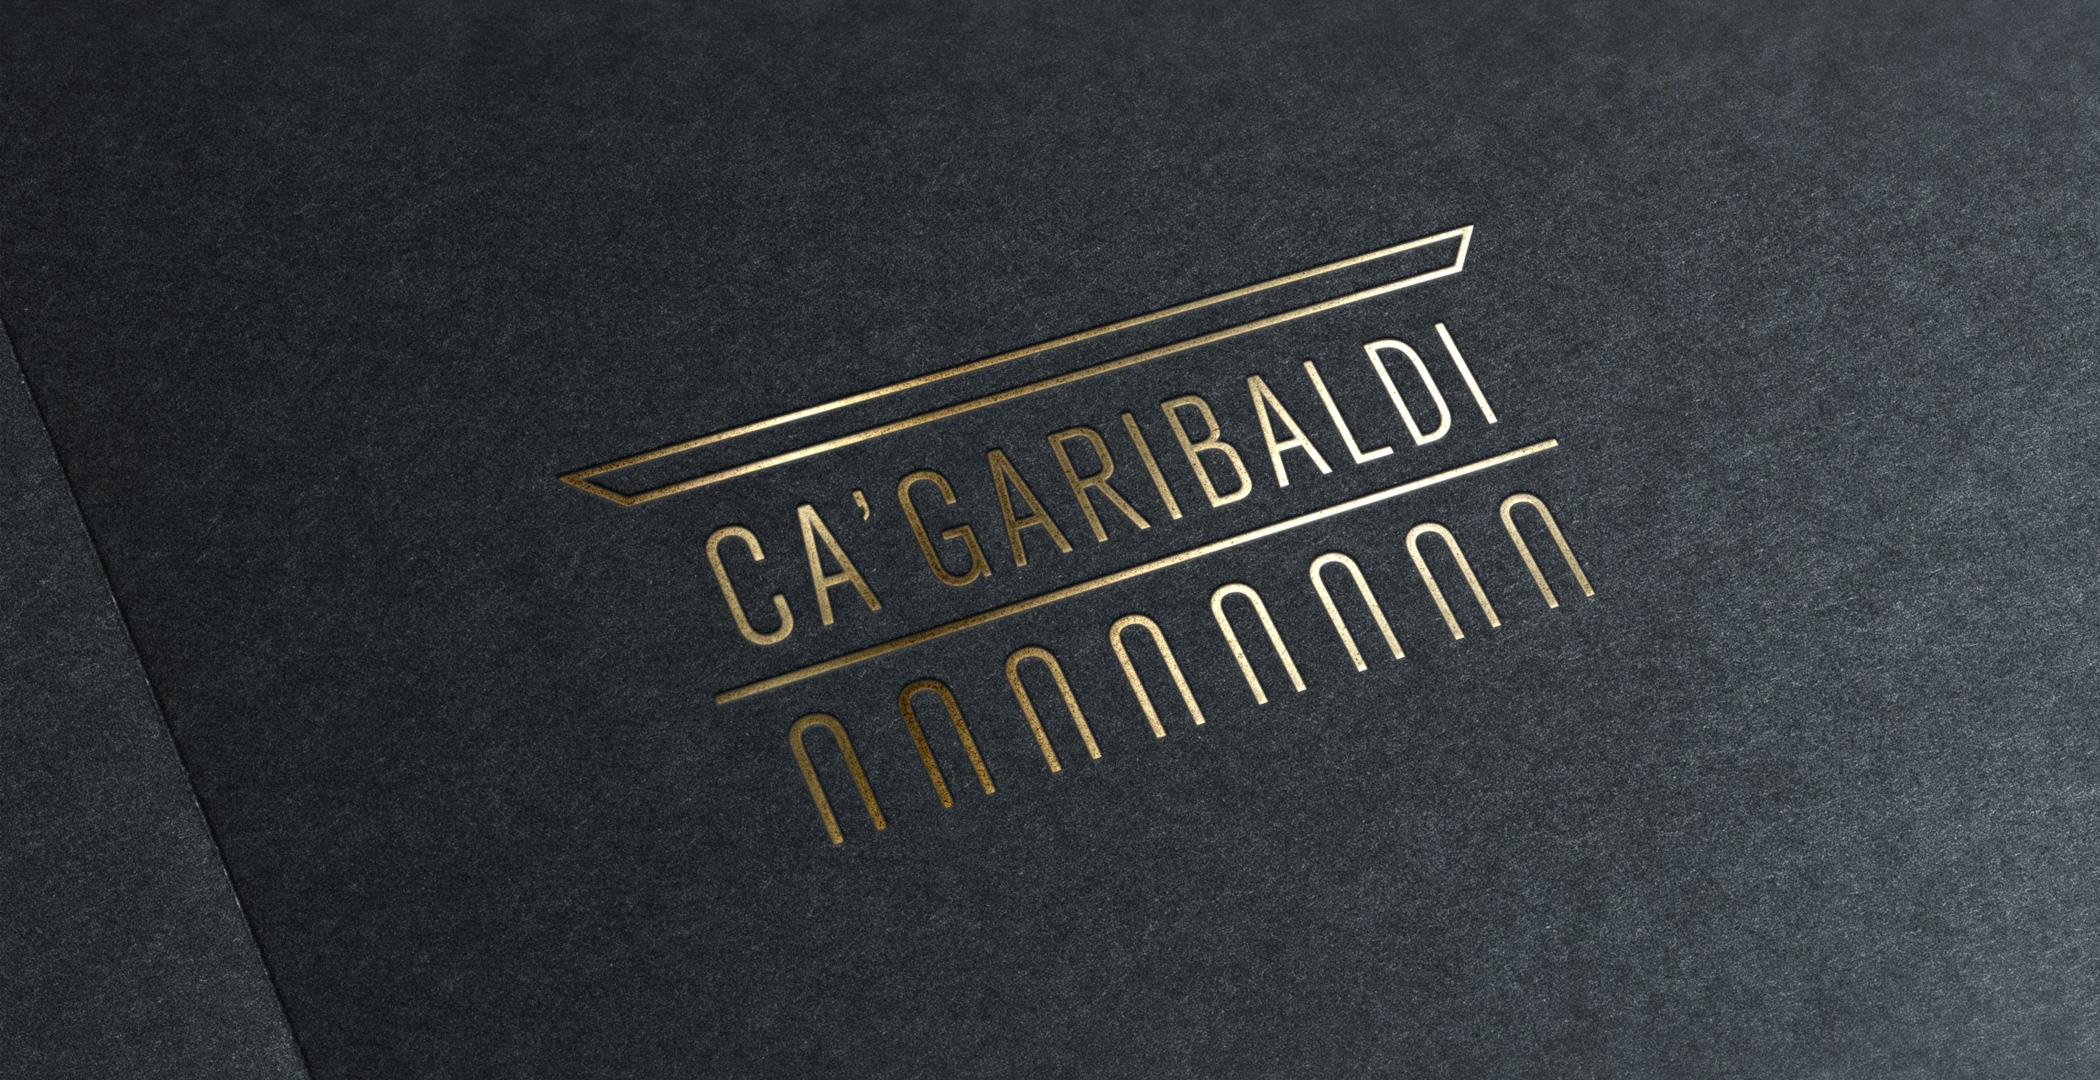 Ca'Garibaldi fond doré logotype